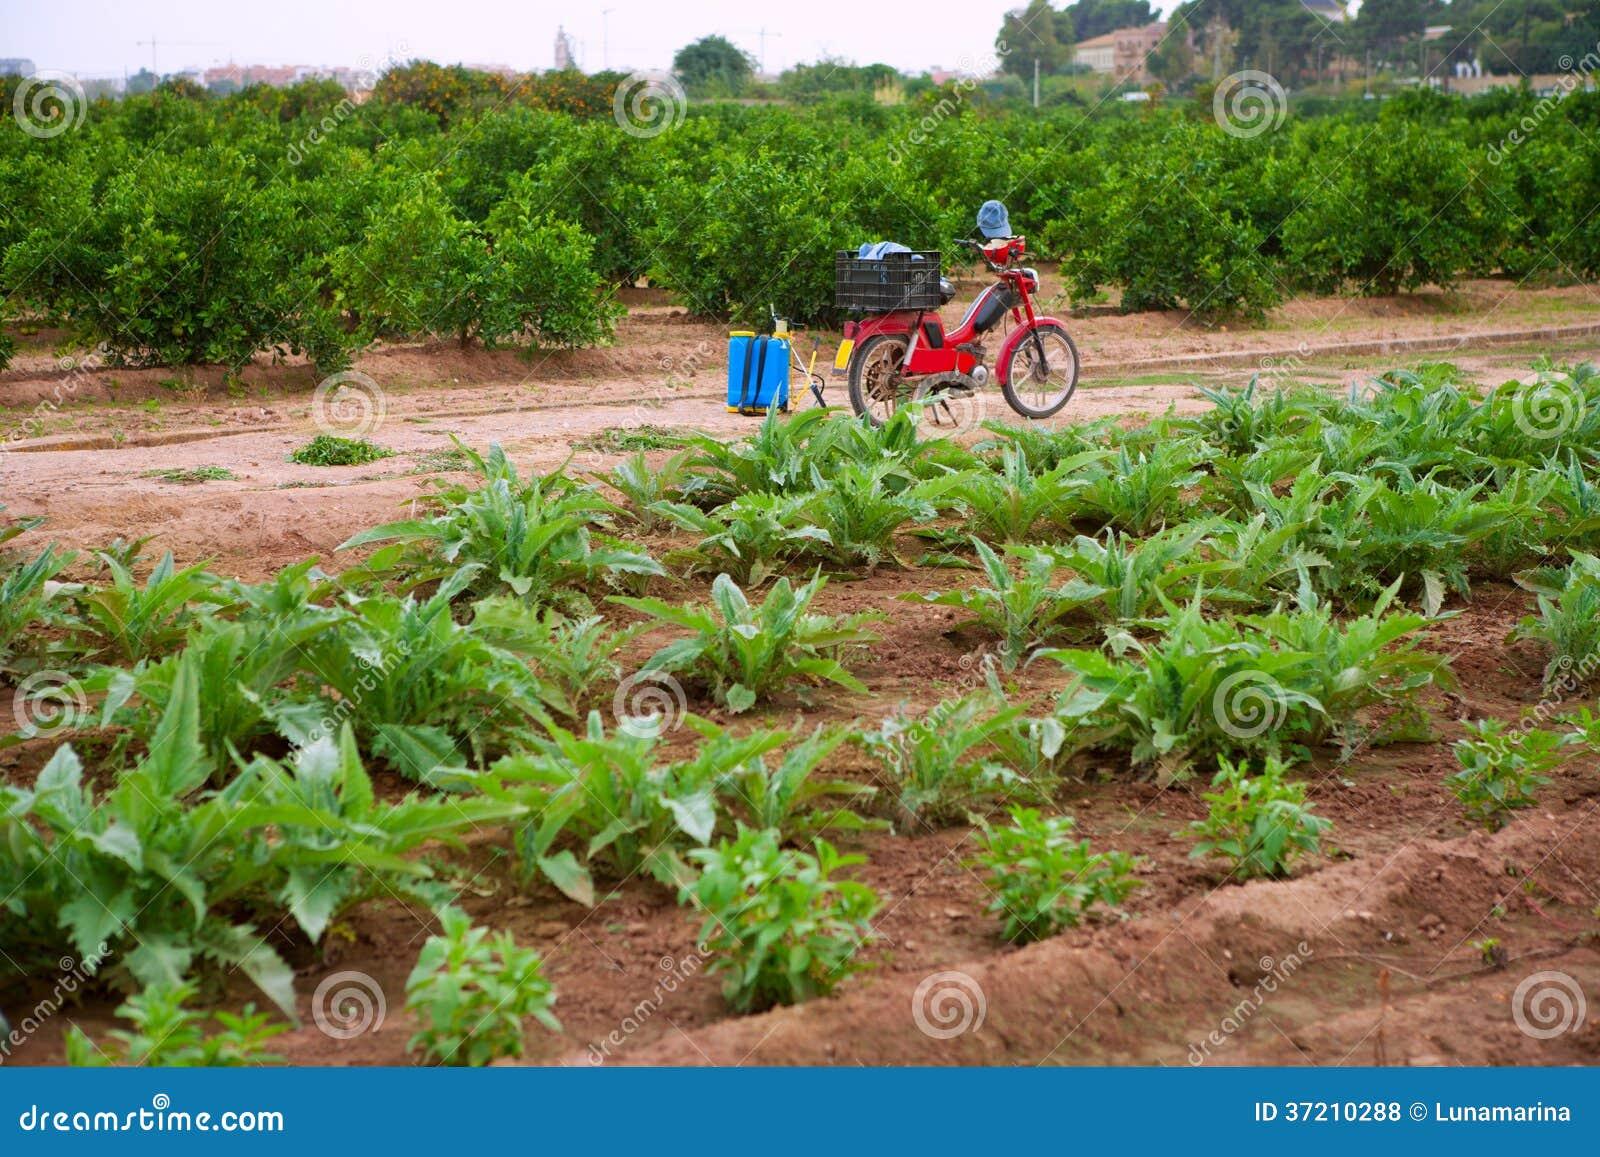 Godella Valencia field smallholding traditional agriculture